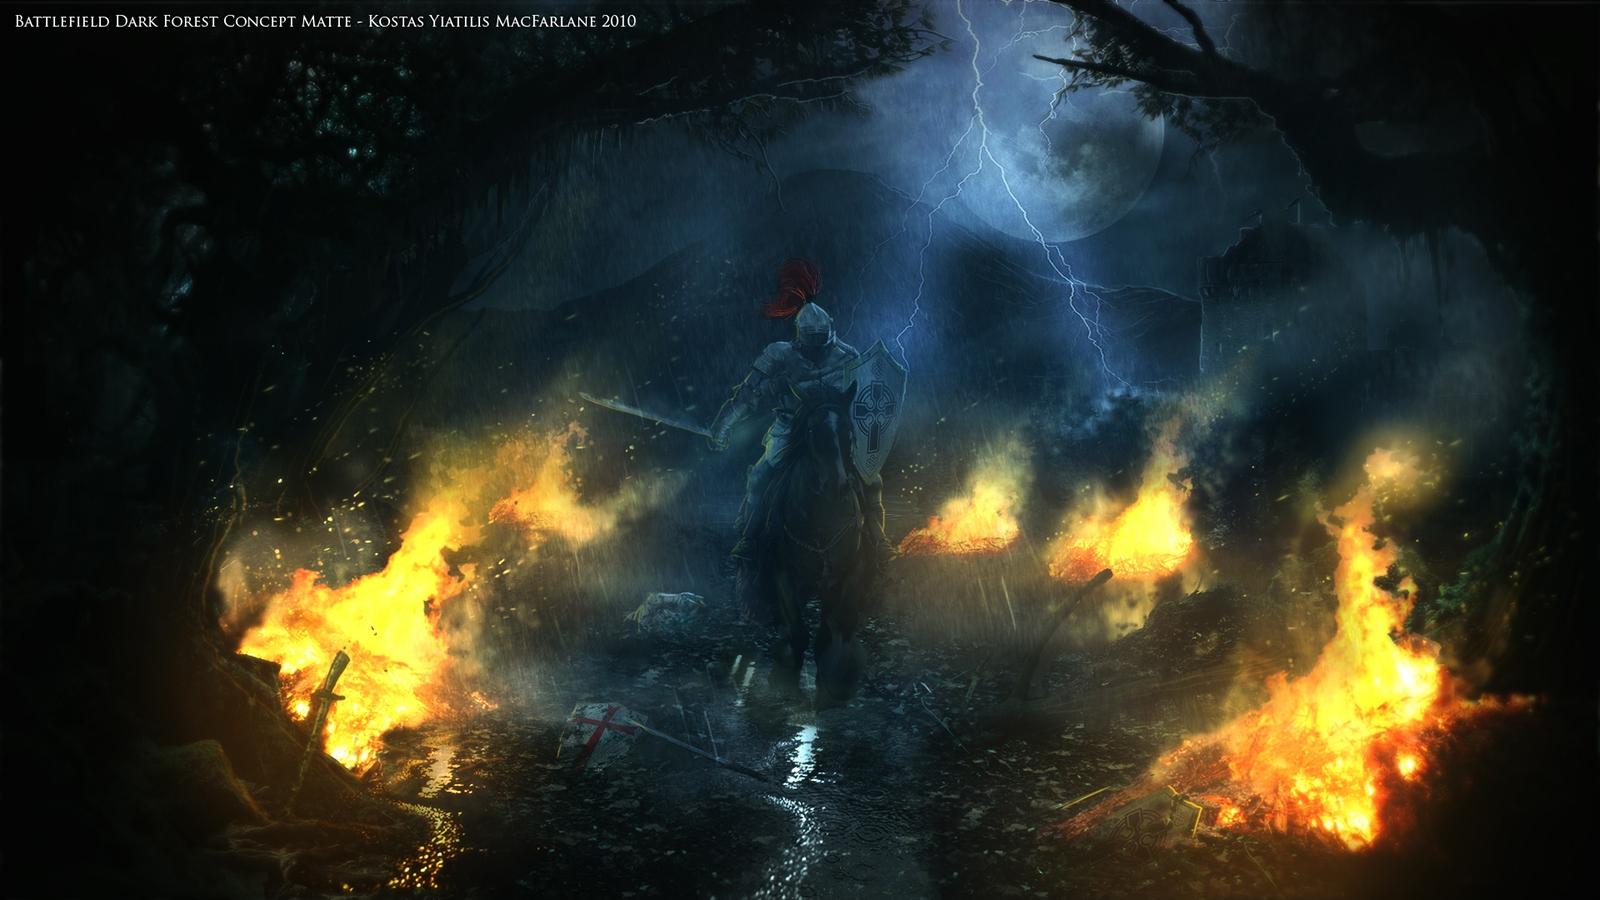 Knight in the night